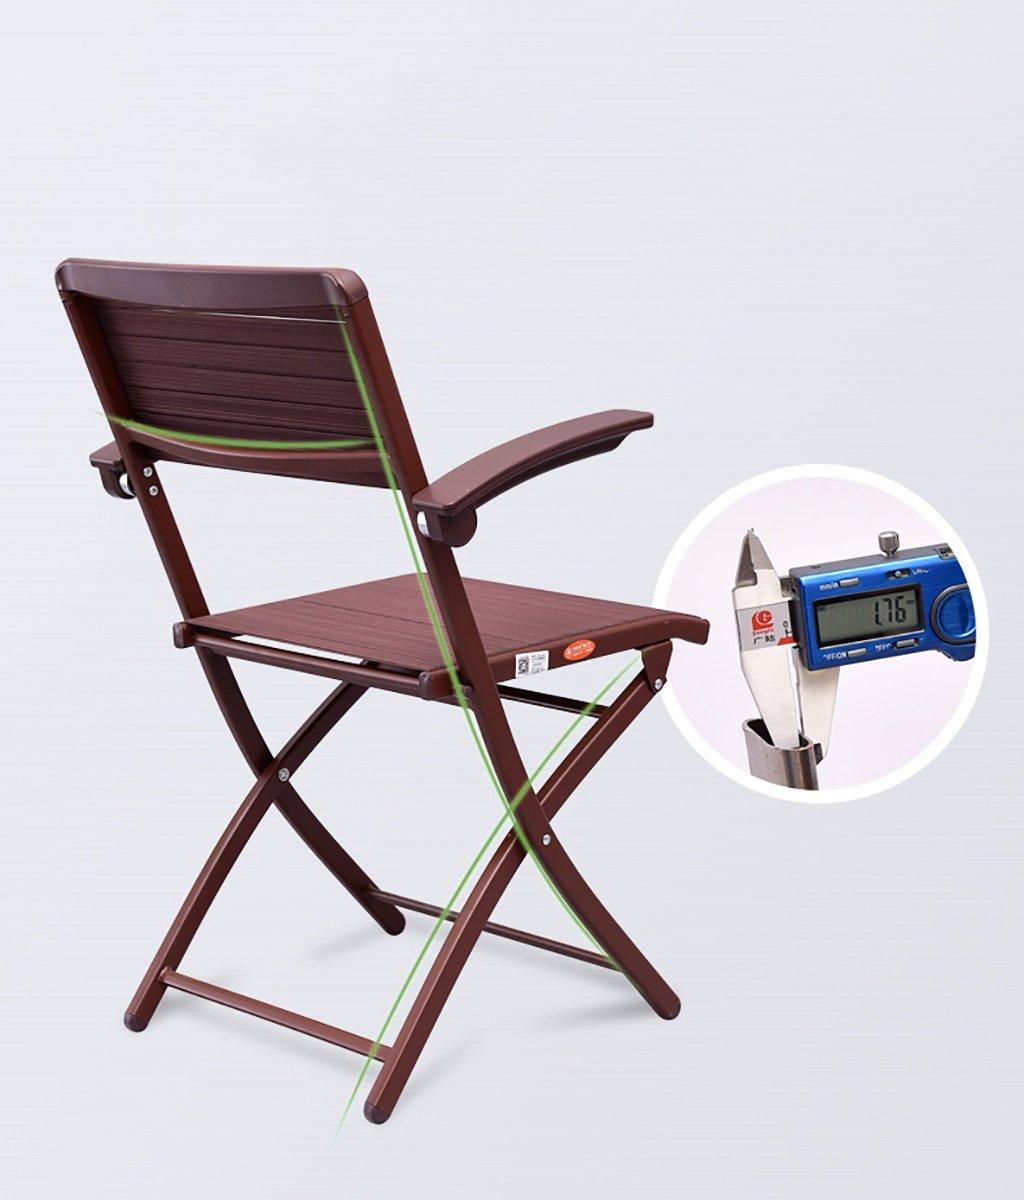 Stol hem hopfällbar dator ryggstöd stol enkel kontorsmöte fåtölj (storlek: 48 x 48 x 89 cm) (färg: A) e